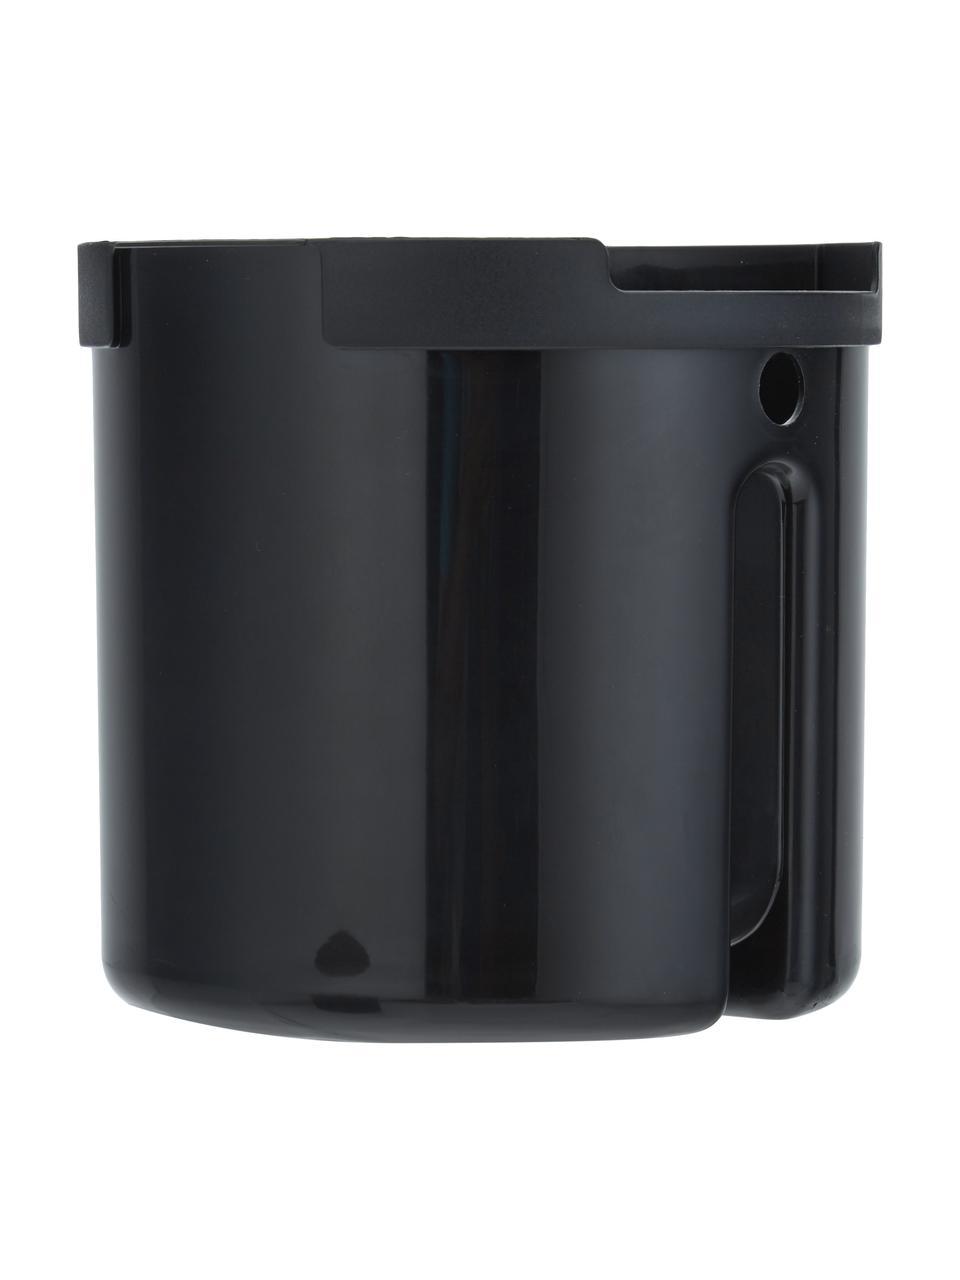 Afvalemmer Ume met pedaal functie, Kunststof (ABS), Mat zwart, Ø 20 x H 22 cm